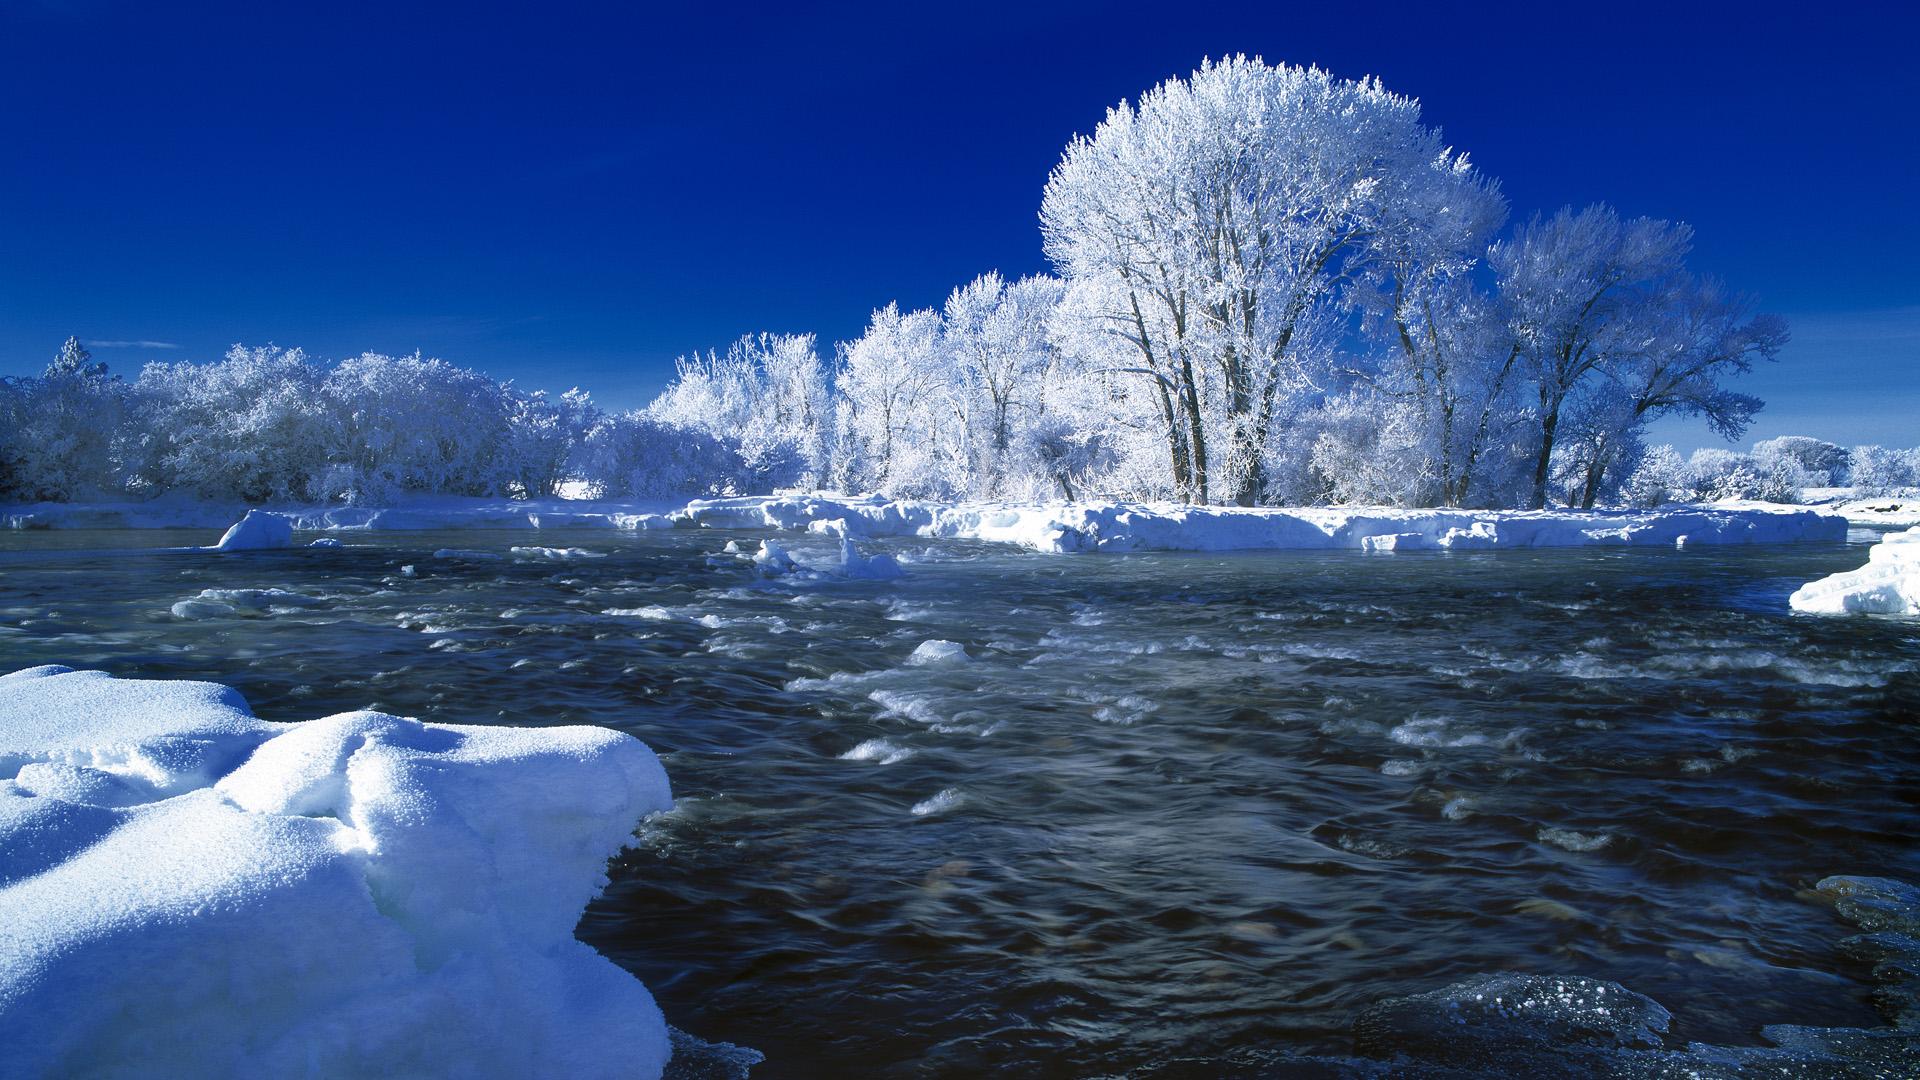 природа зима деревья река снег на телефон